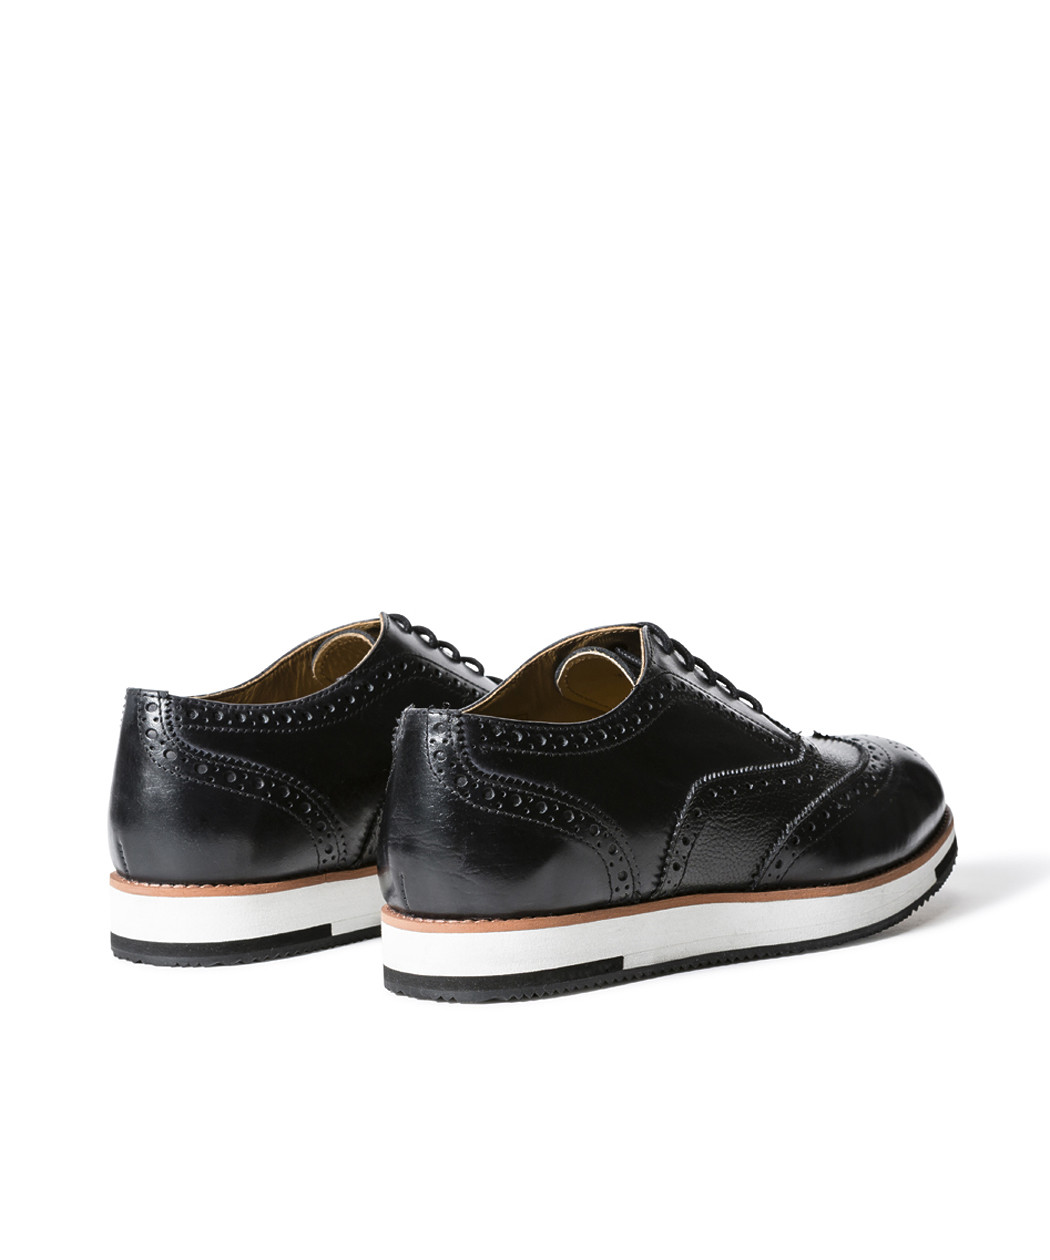 ba890399fb5 Van Heusen Men s Shoe Hybrid Brogue Black